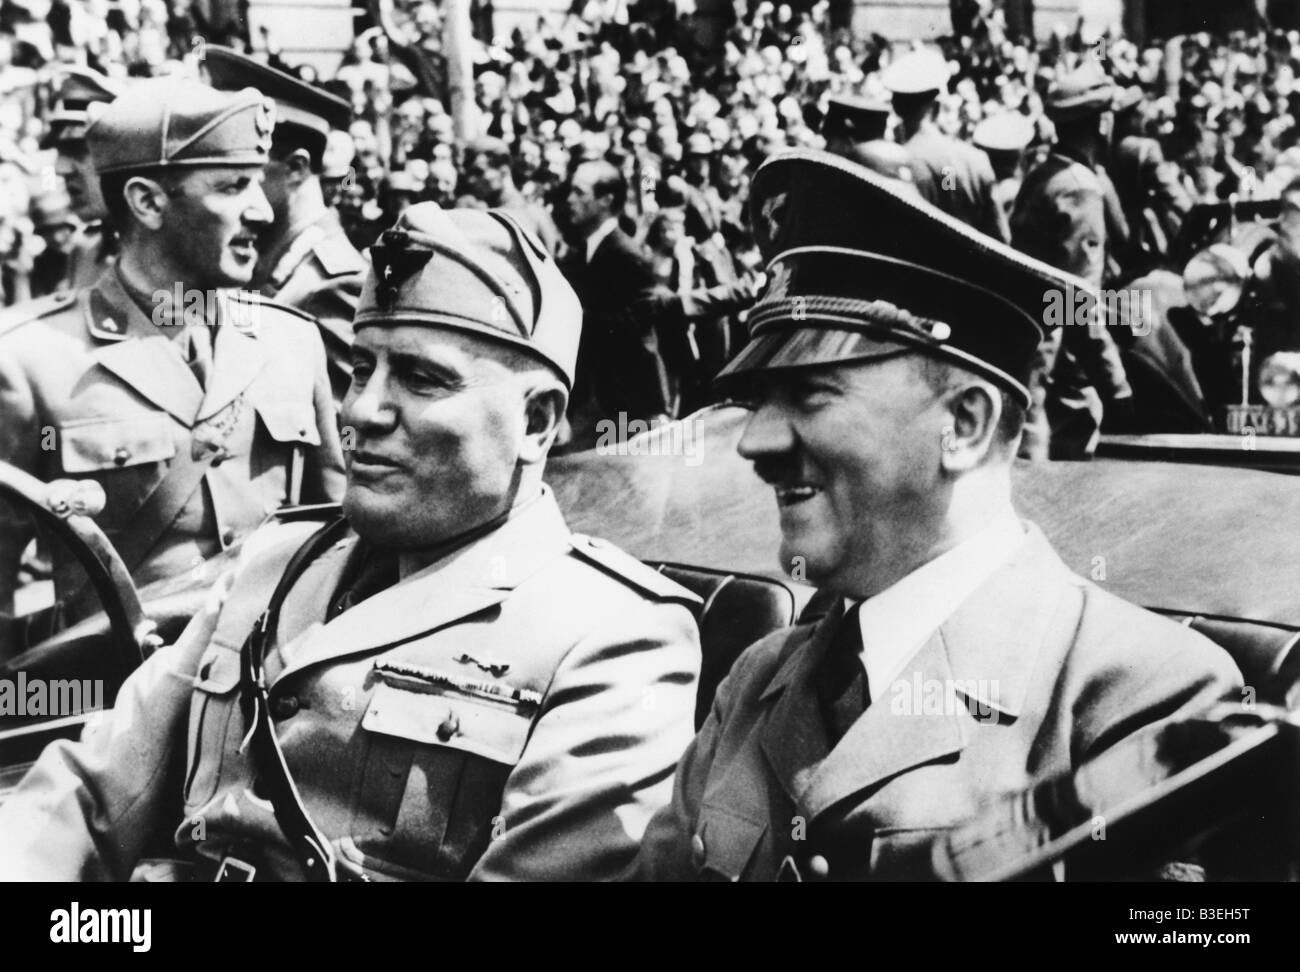 Hitler & Mussolini in einem Auto, 1940. Stockbild